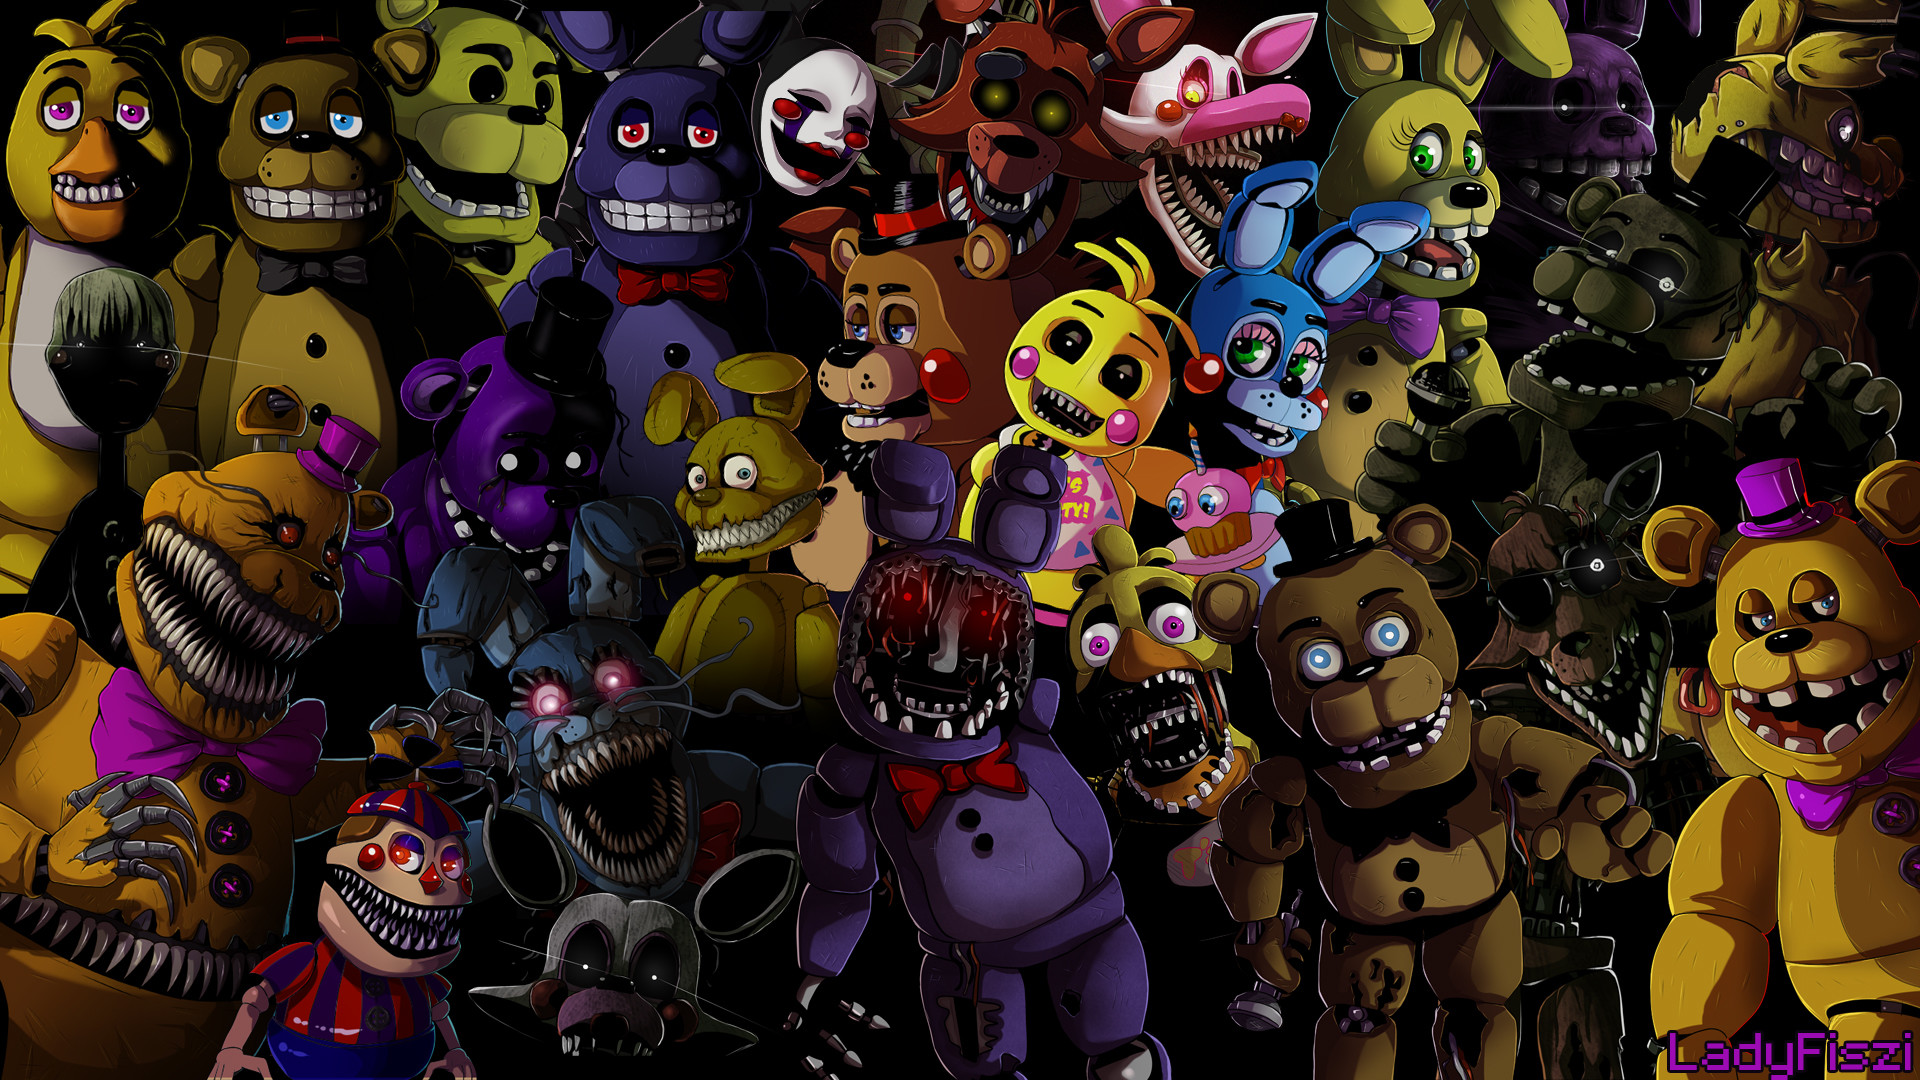 … Five nights at Freddy's animatronics wallpaper by LadyFiszi